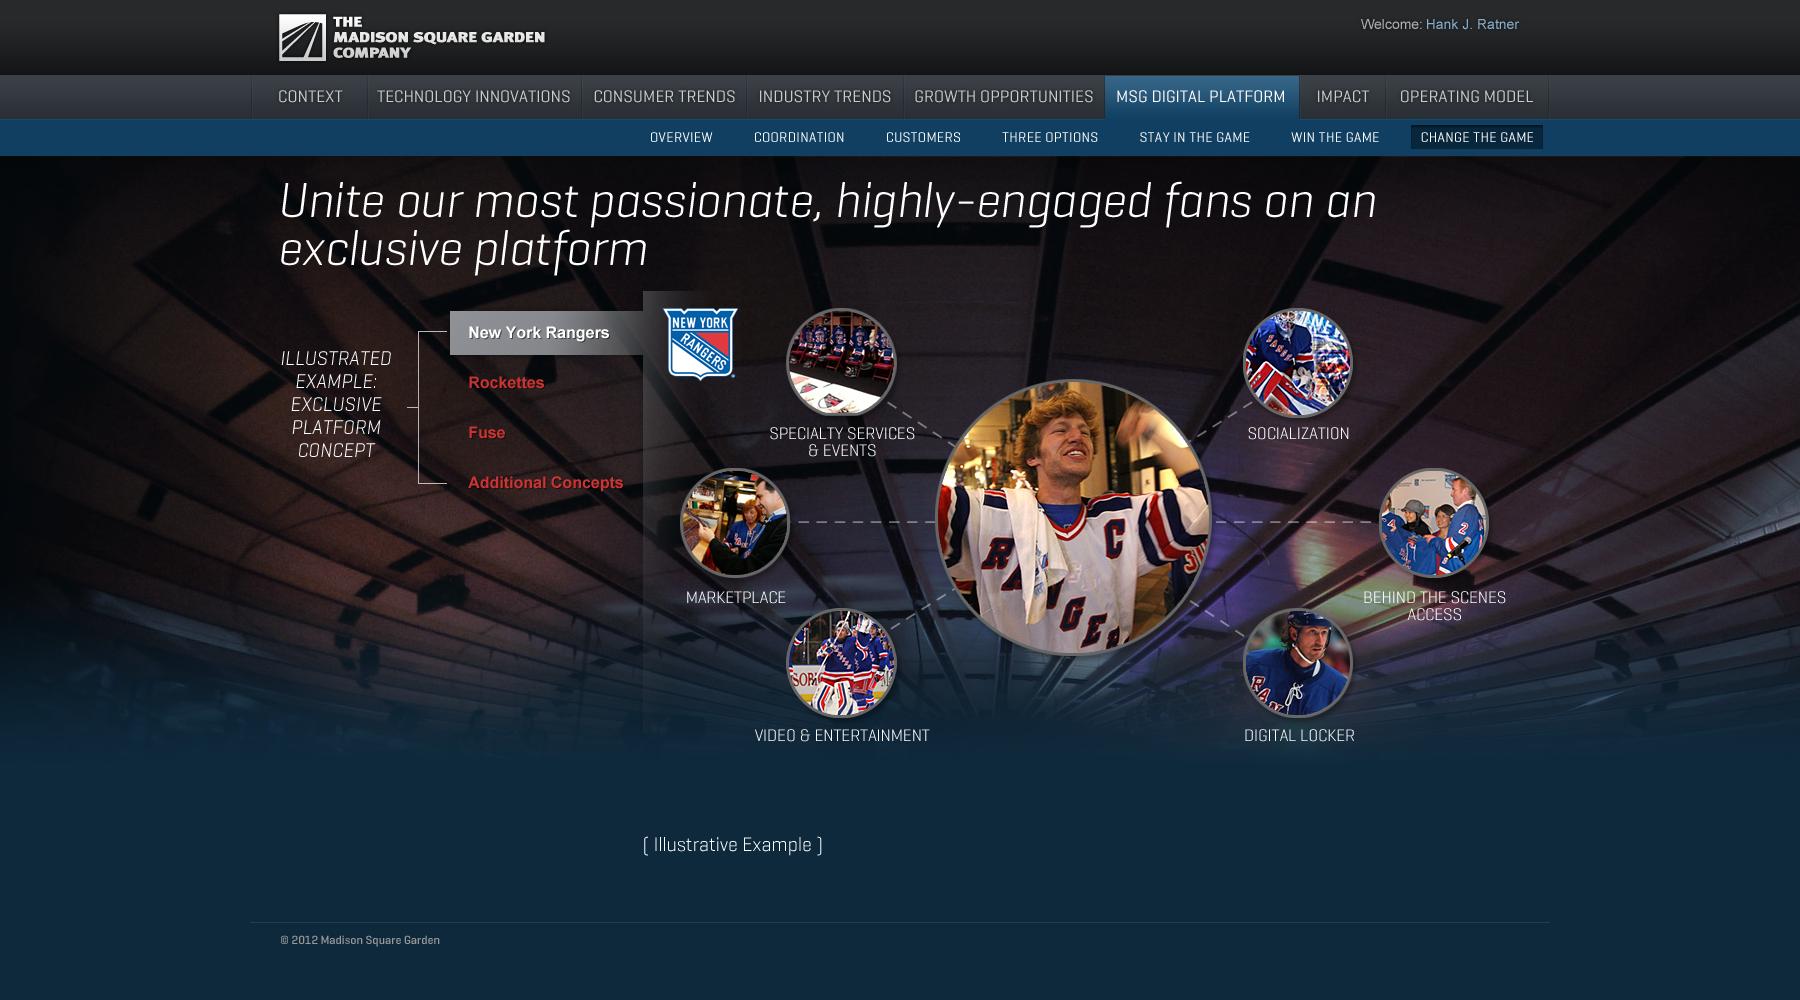 Madison Square Garden: MSG Digital Platform/Change the Game - New York Rangers